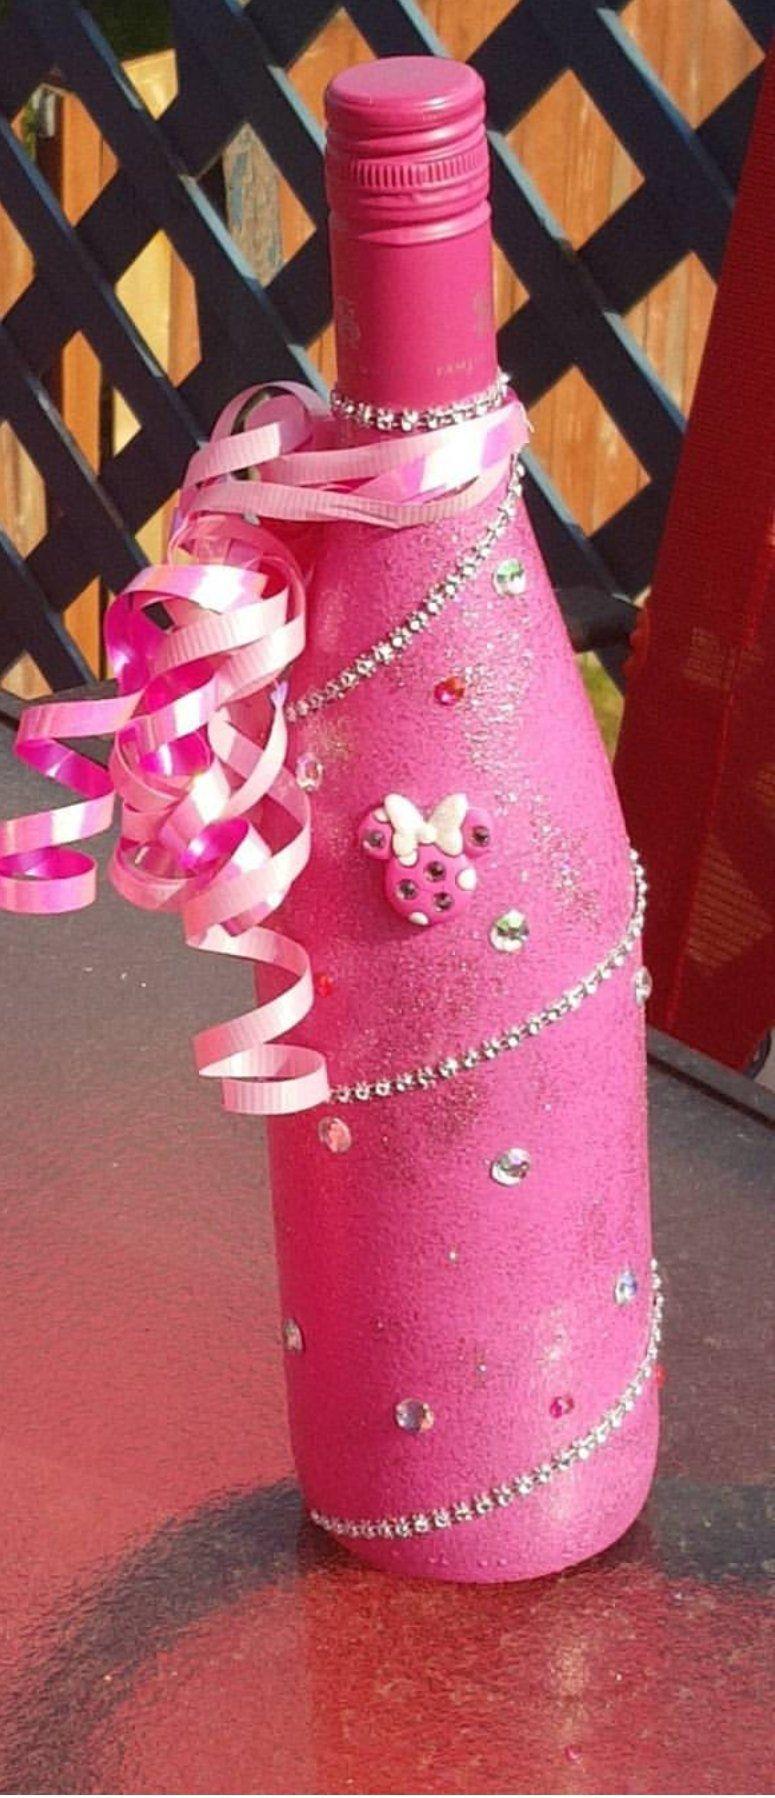 Pink Minnie Custom Bottle Decor Minnie Mouse Pink Keepsake By Dazzlebykay On Etsy Custom Decor Decor Bottles Decoration